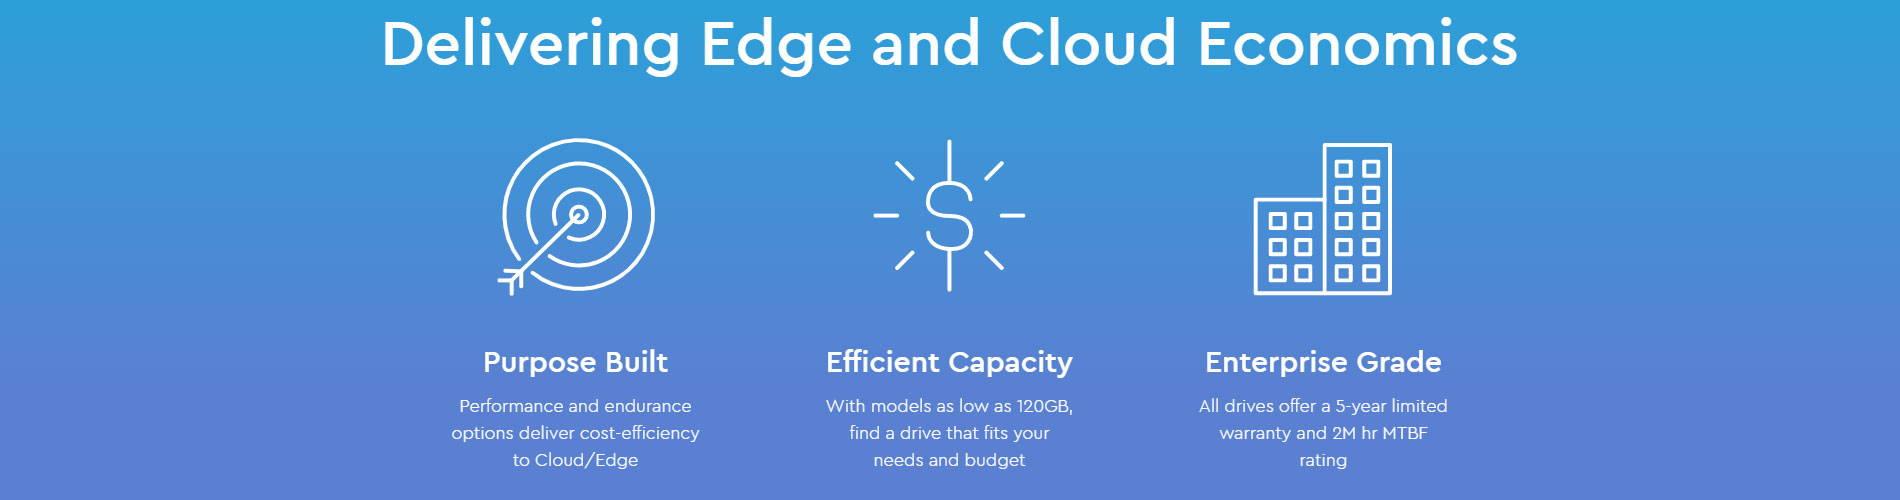 Delivering Edge and Cloud Economics